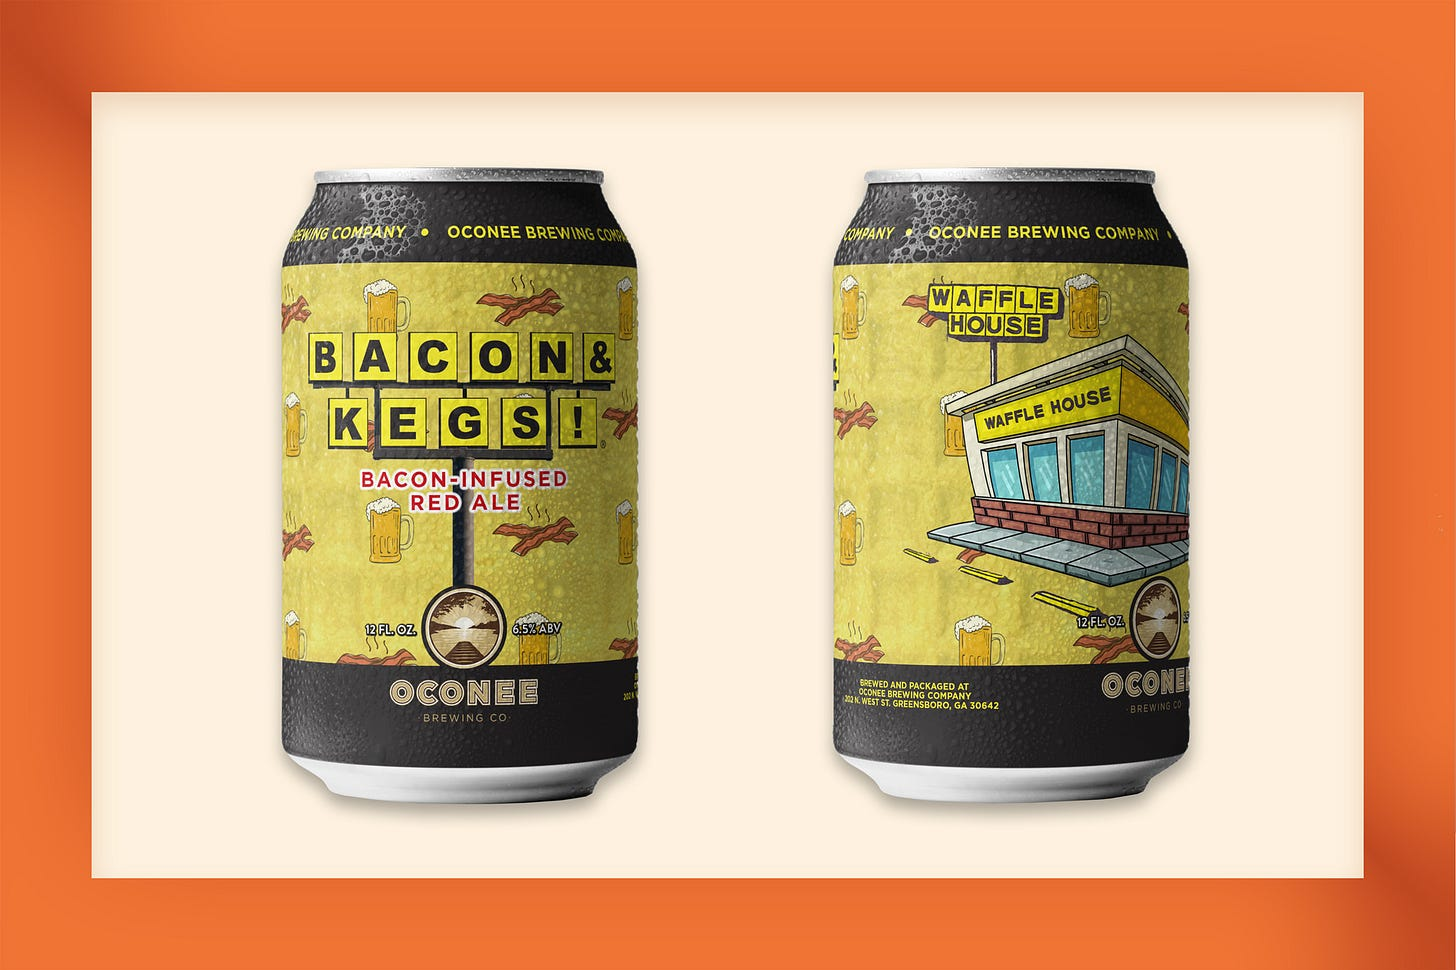 Waffle House Bacon & Kegs beer